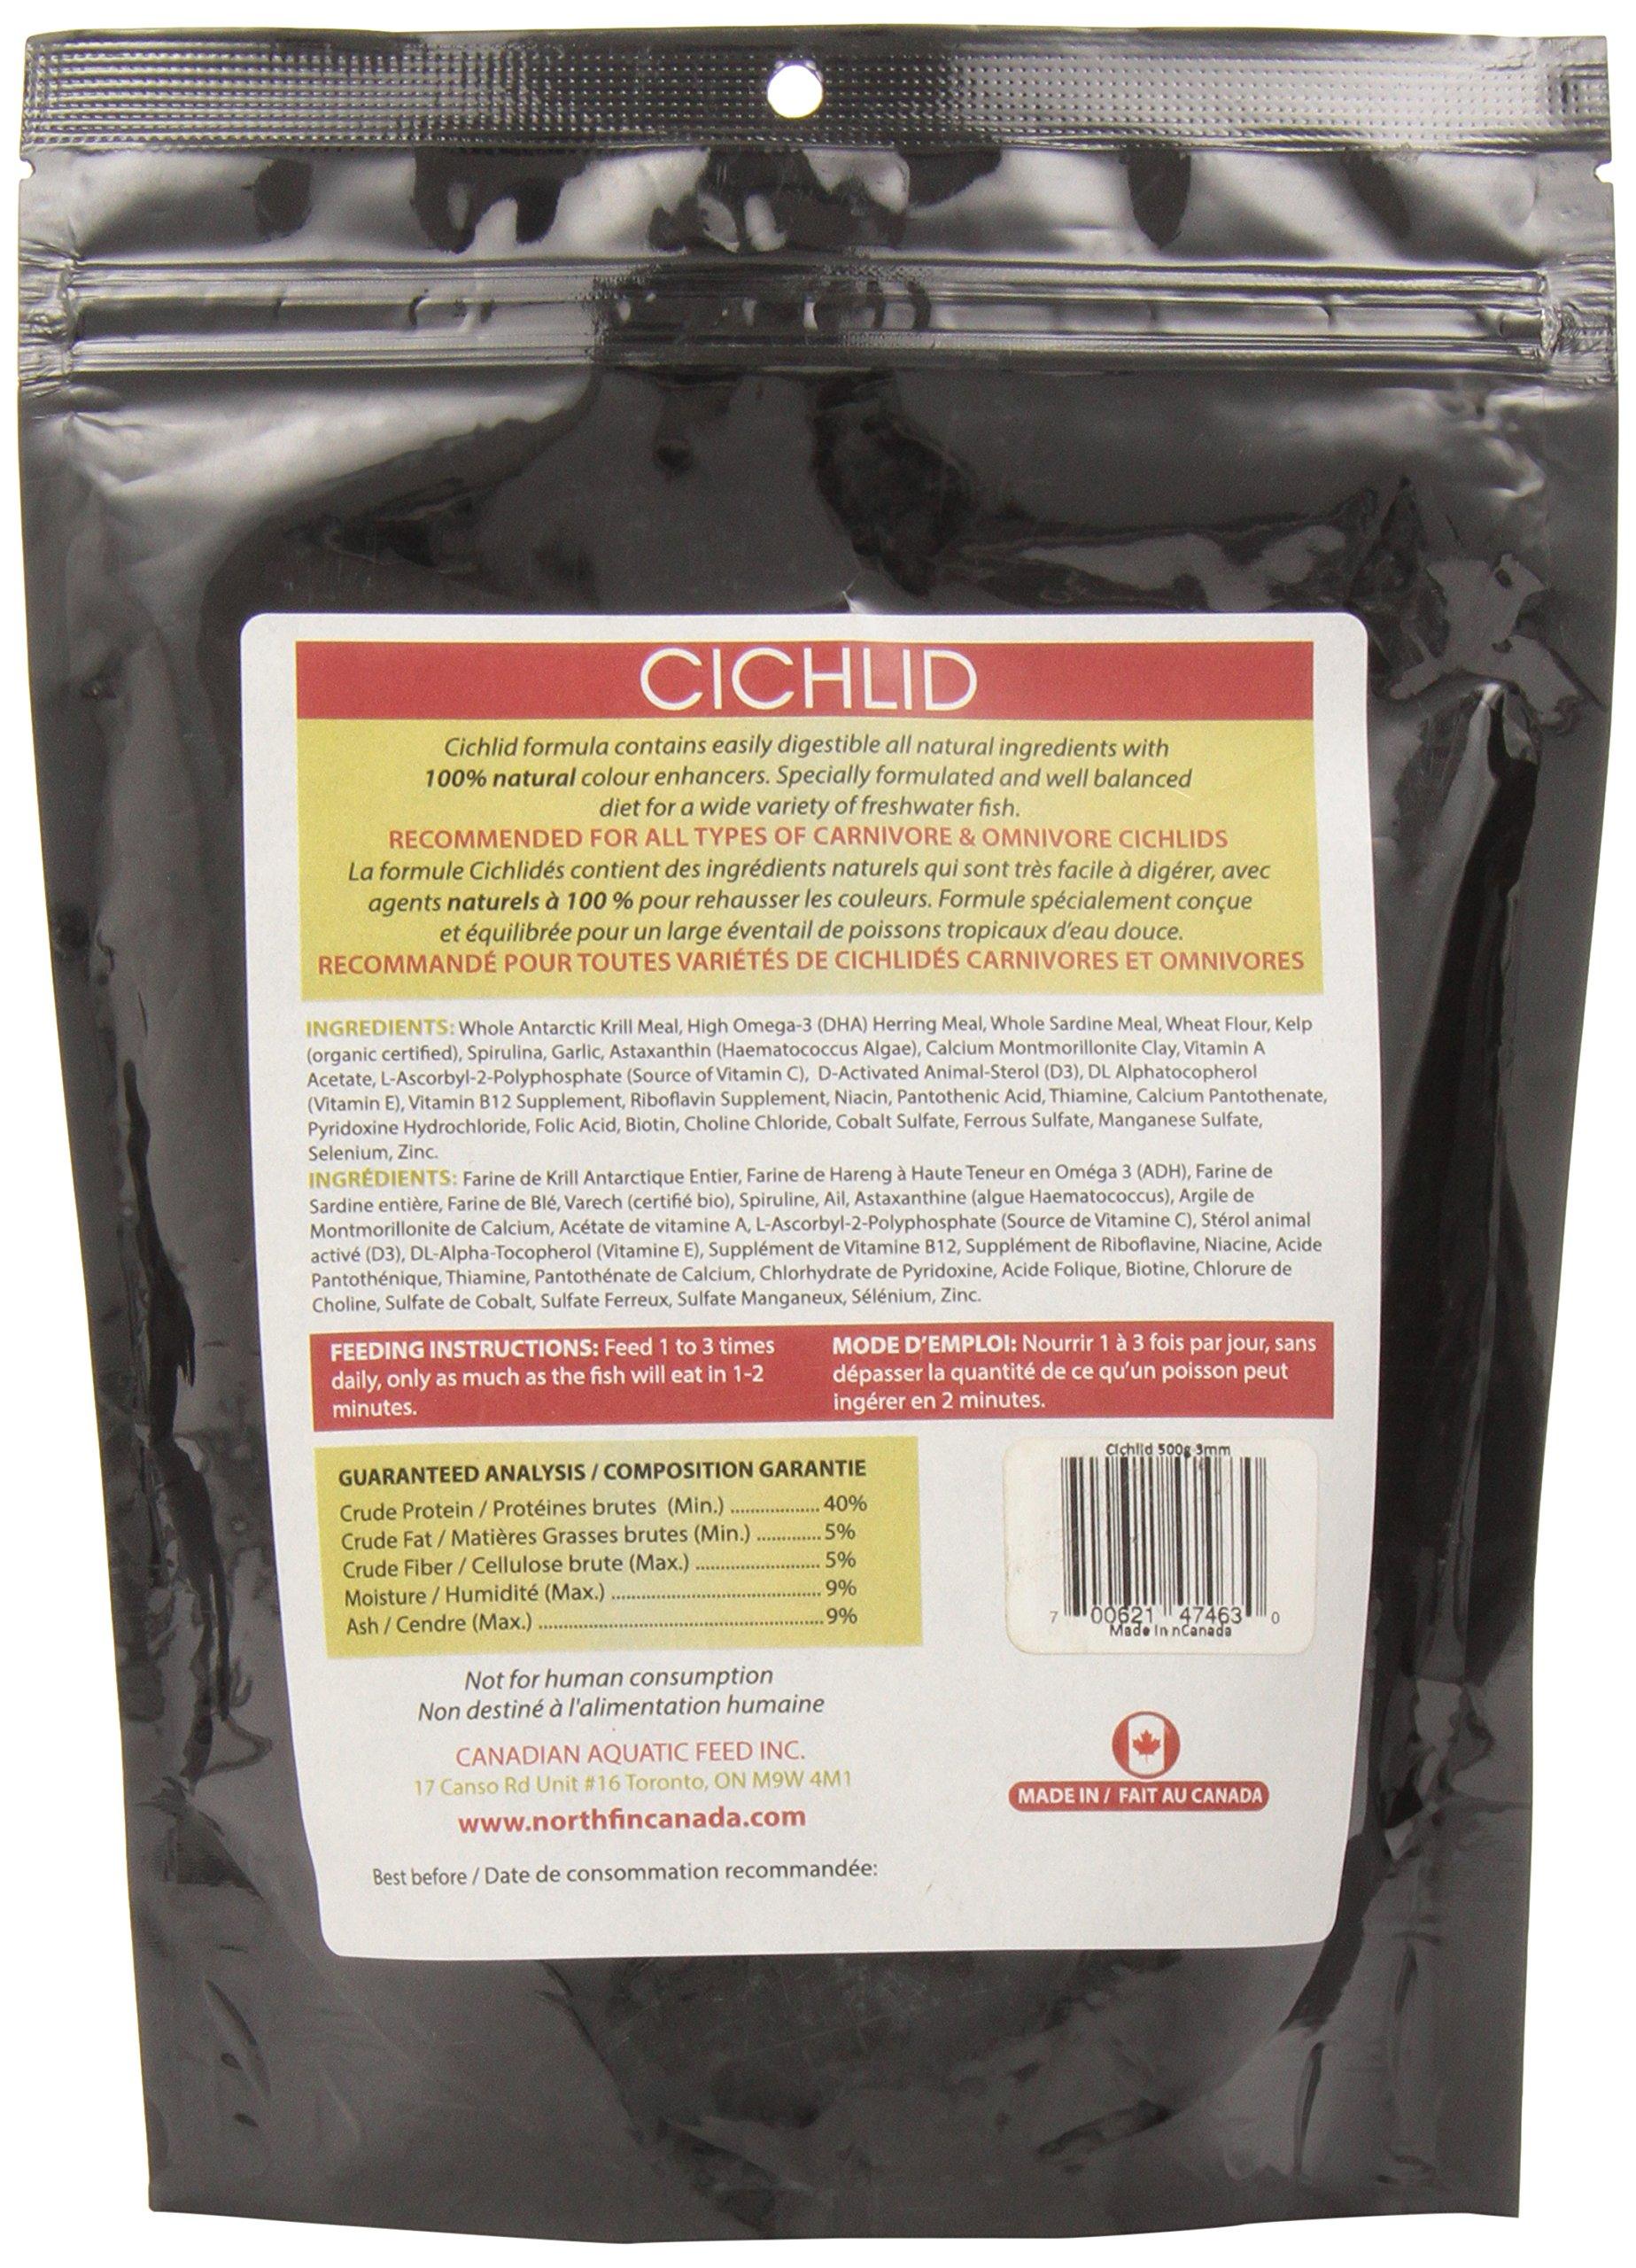 Northfin Fish Food, 3 mm Sinking Pellets, 500 g, Cichlid Formula by Northfin (Image #4)